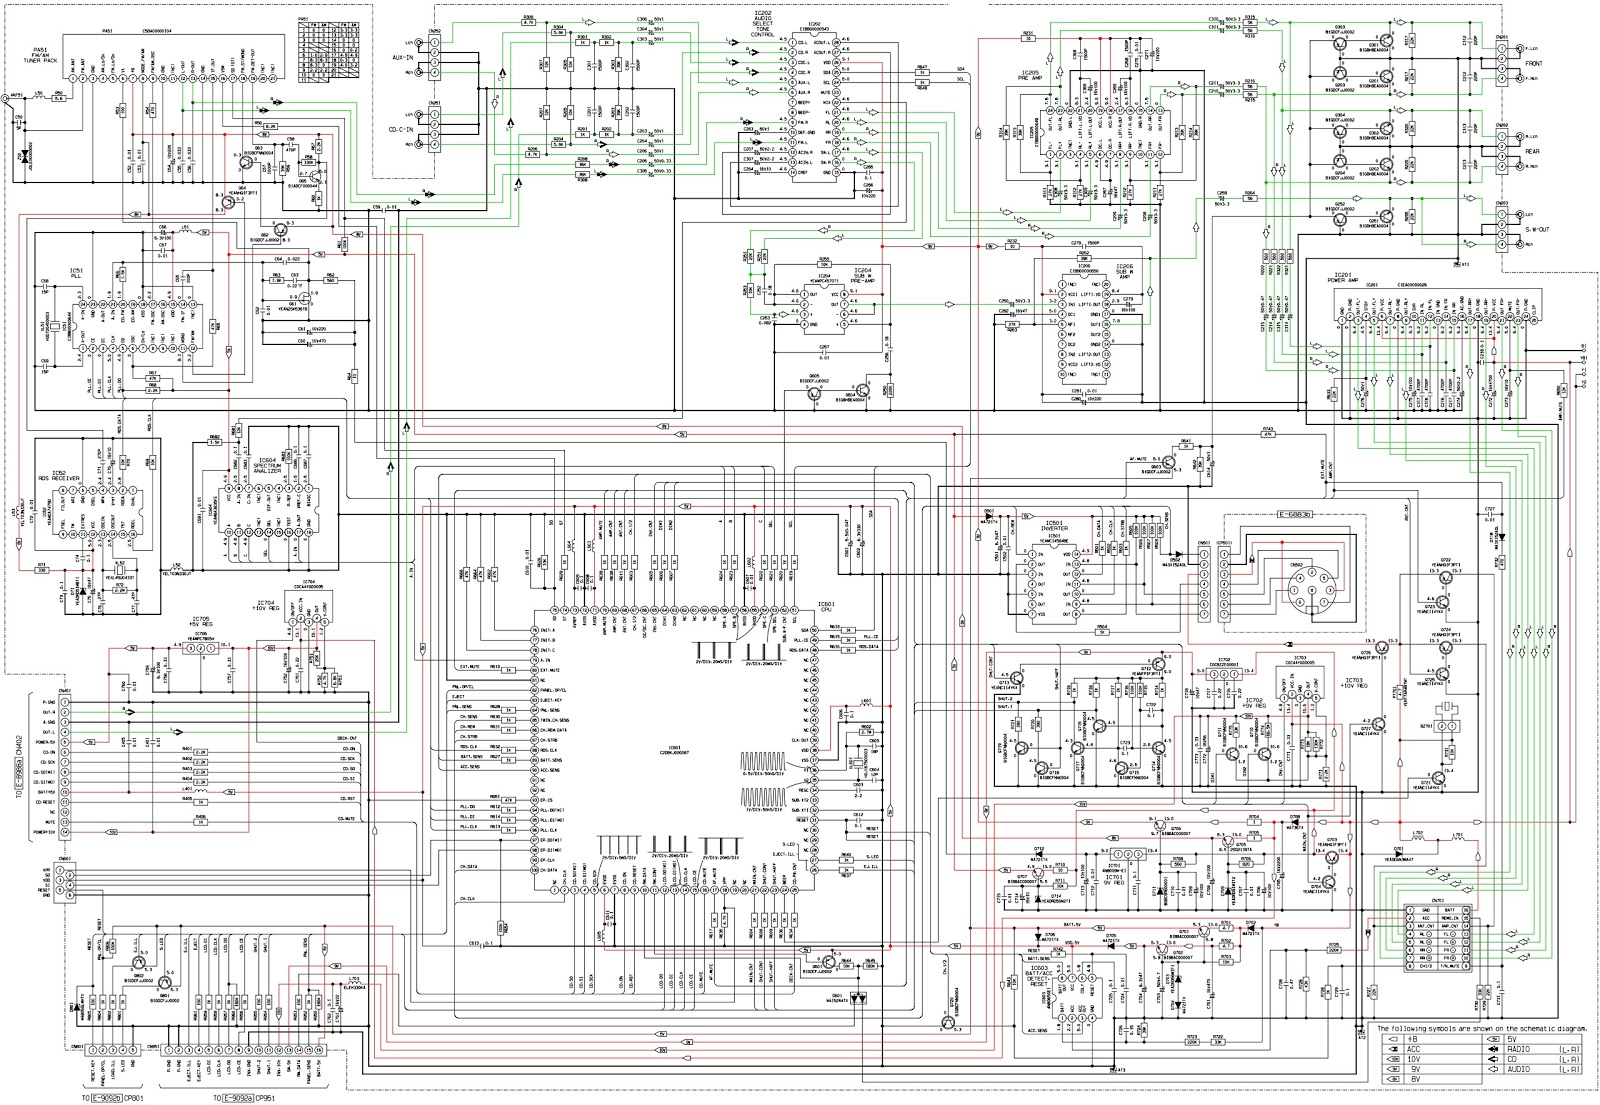 47 quot lg scarlet tv wiring diagram - auto electrical wiring diagram pioneer deh p6600 wiring diagram